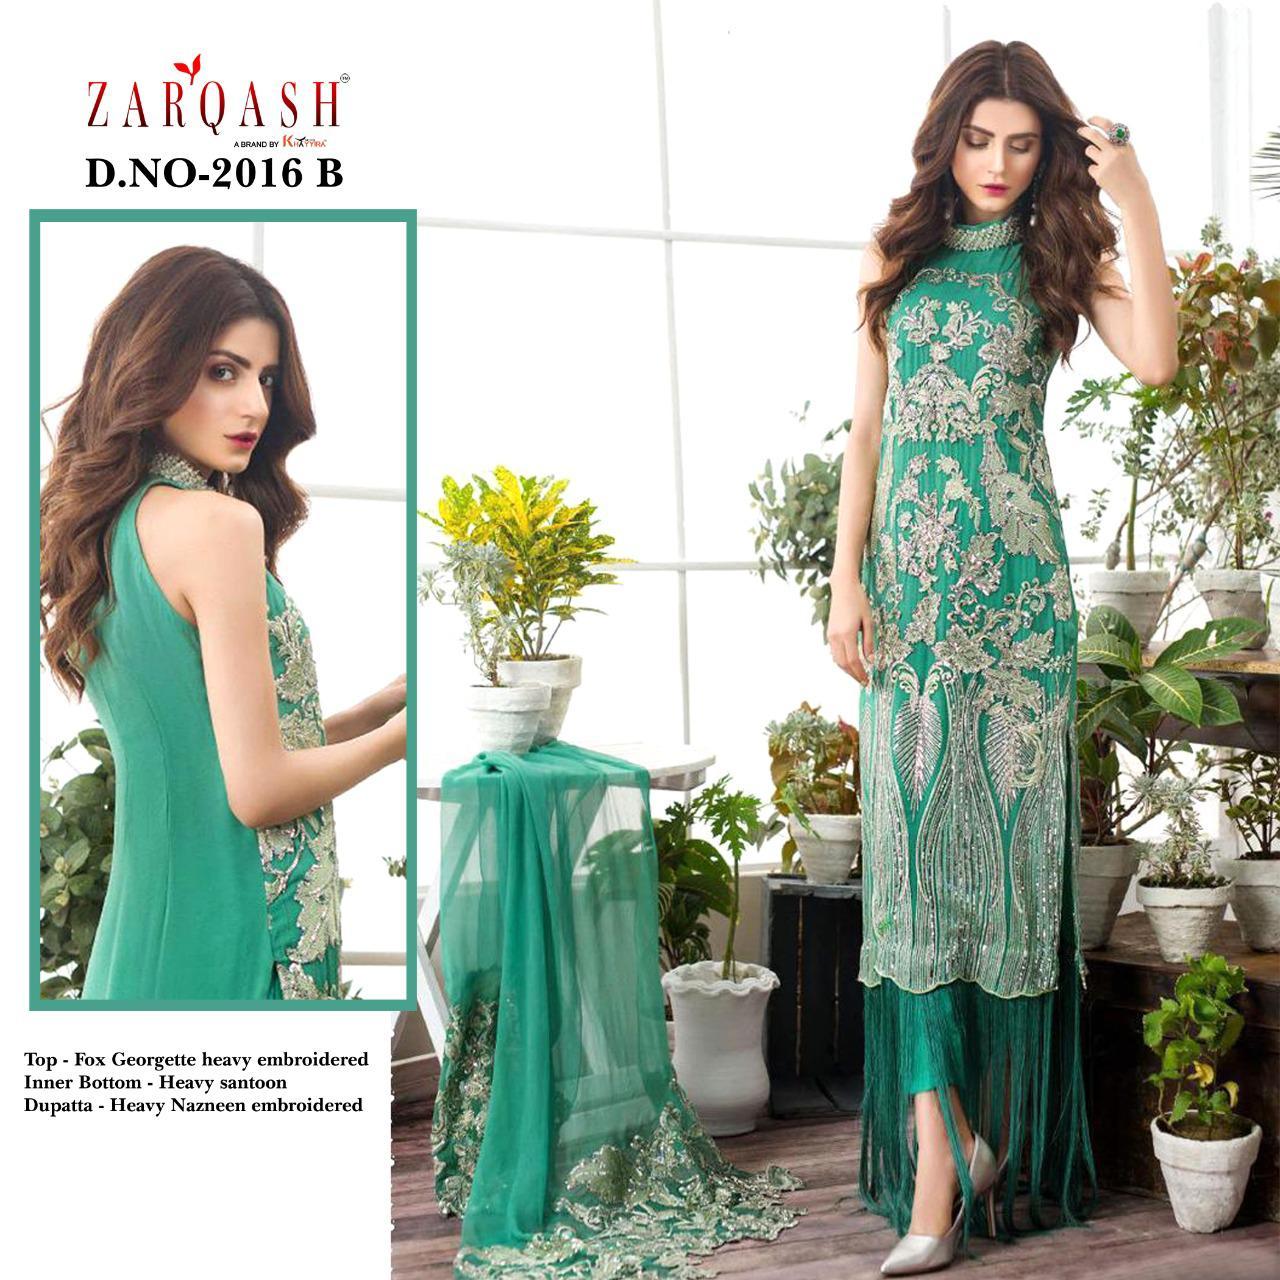 Zarqash Faiza by Khayyira Salwar Suit Wholesale Catalog 3 Pcs 1 - Zarqash Faiza by Khayyira Salwar Suit Wholesale Catalog 3 Pcs